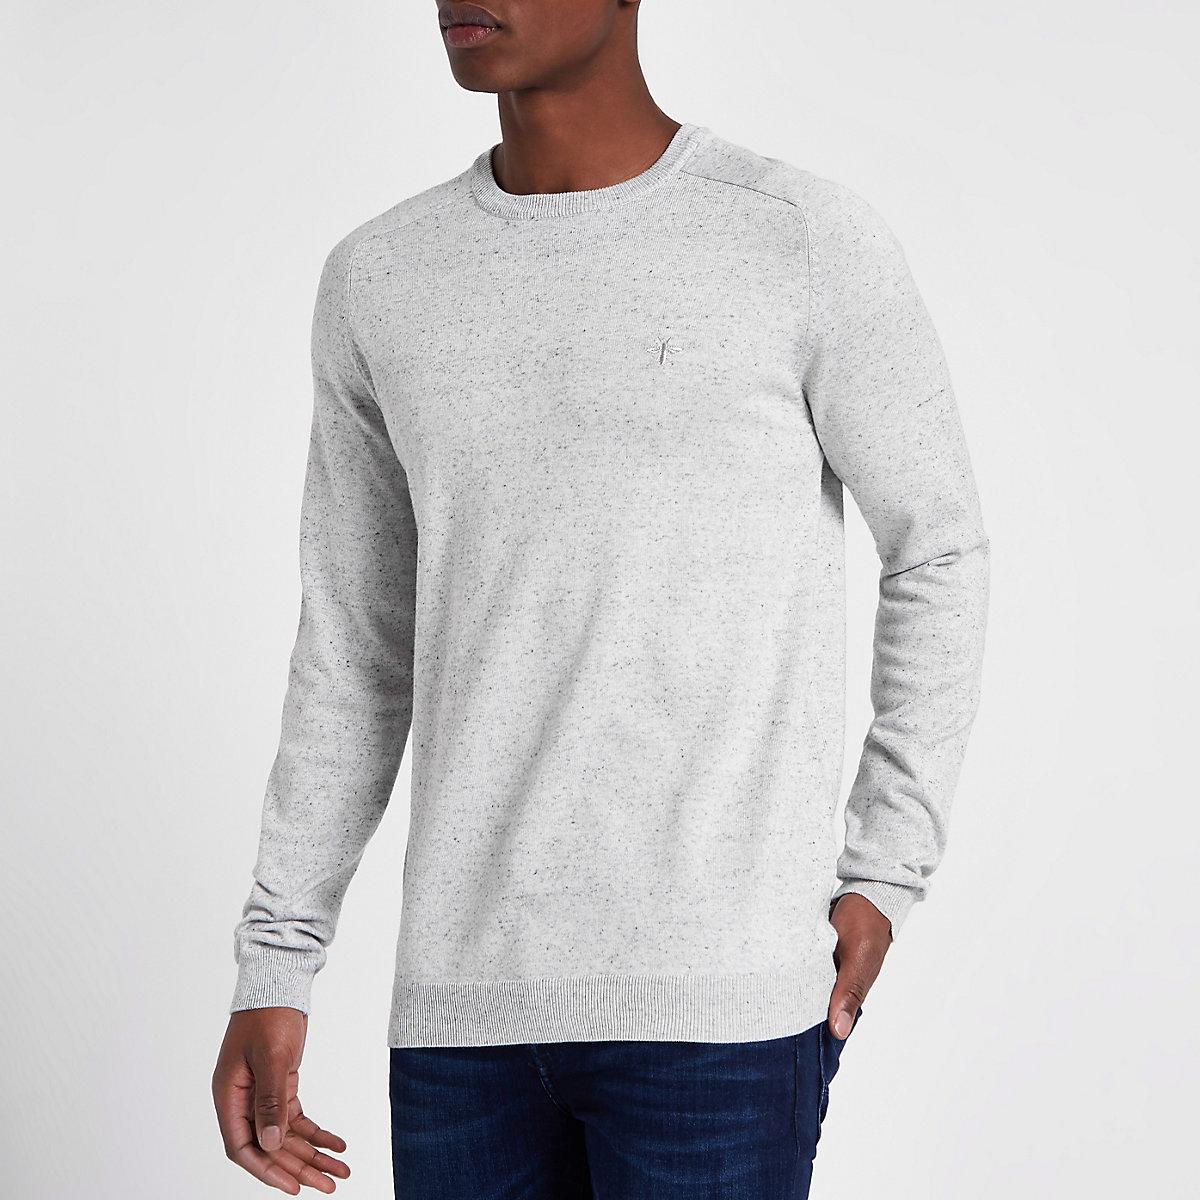 Grey slim fit crew neck sweater